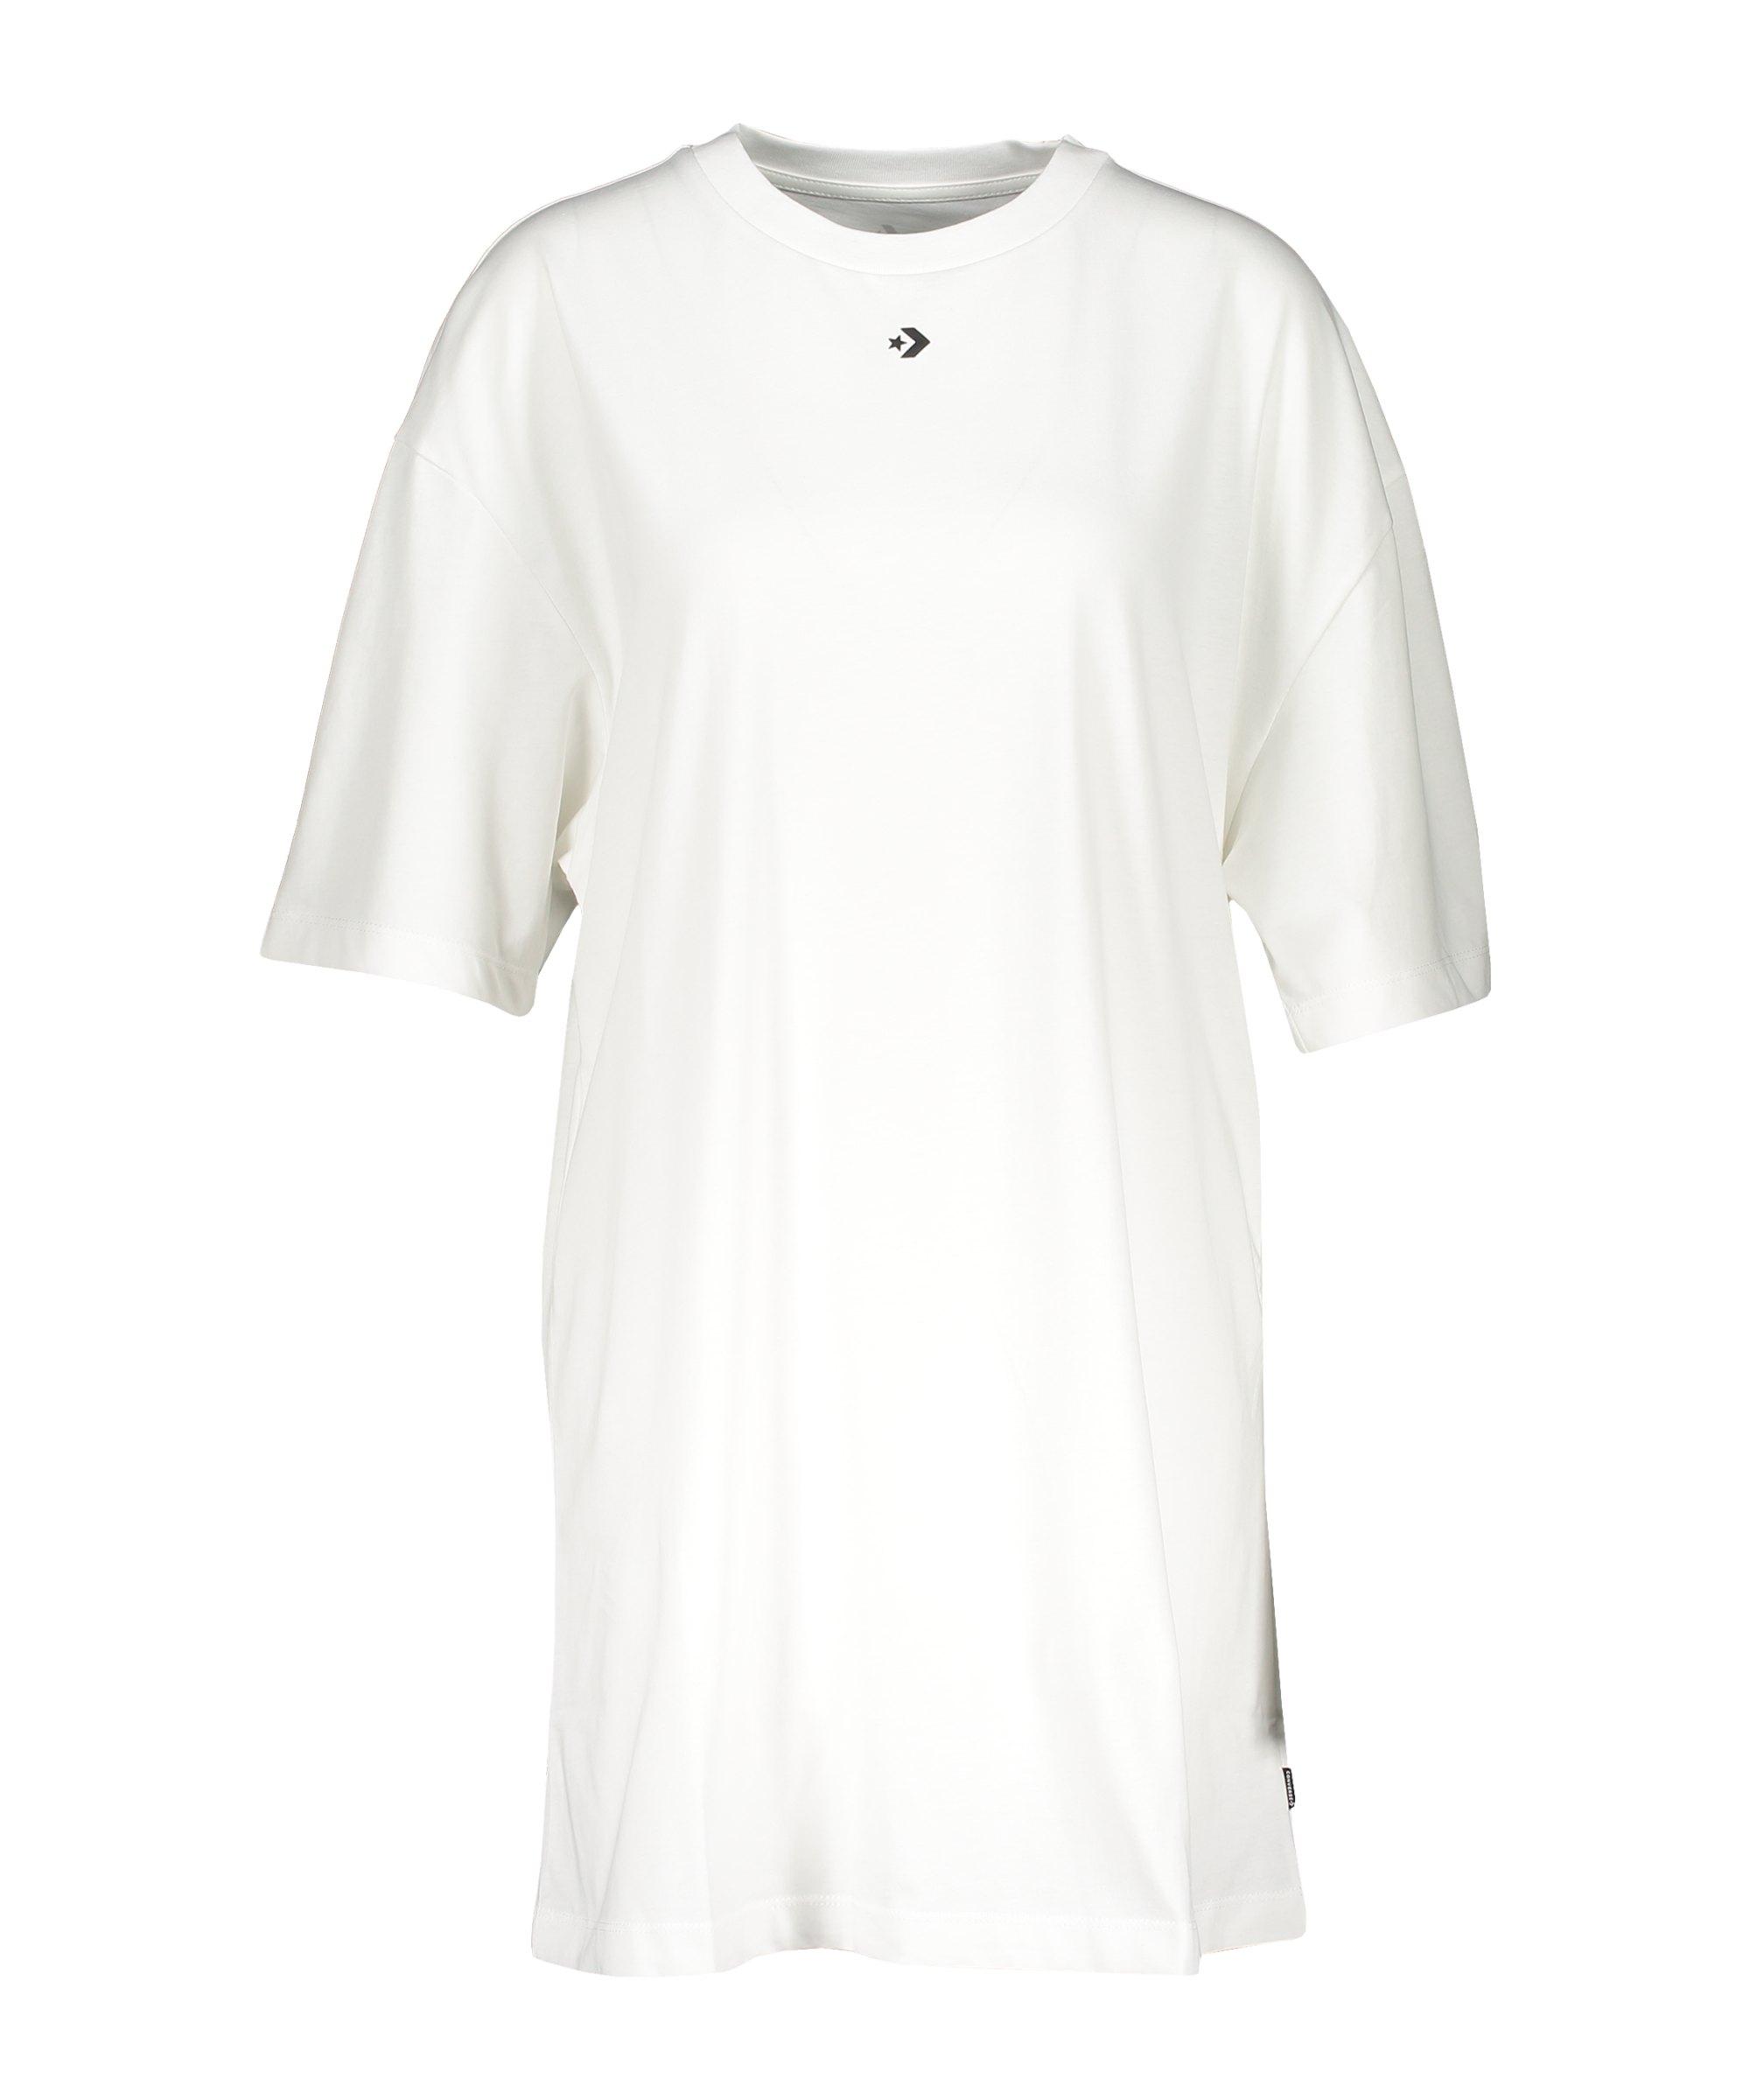 Converse Wordmark Damen T-Shirtkleid Weiss F102 - weiss